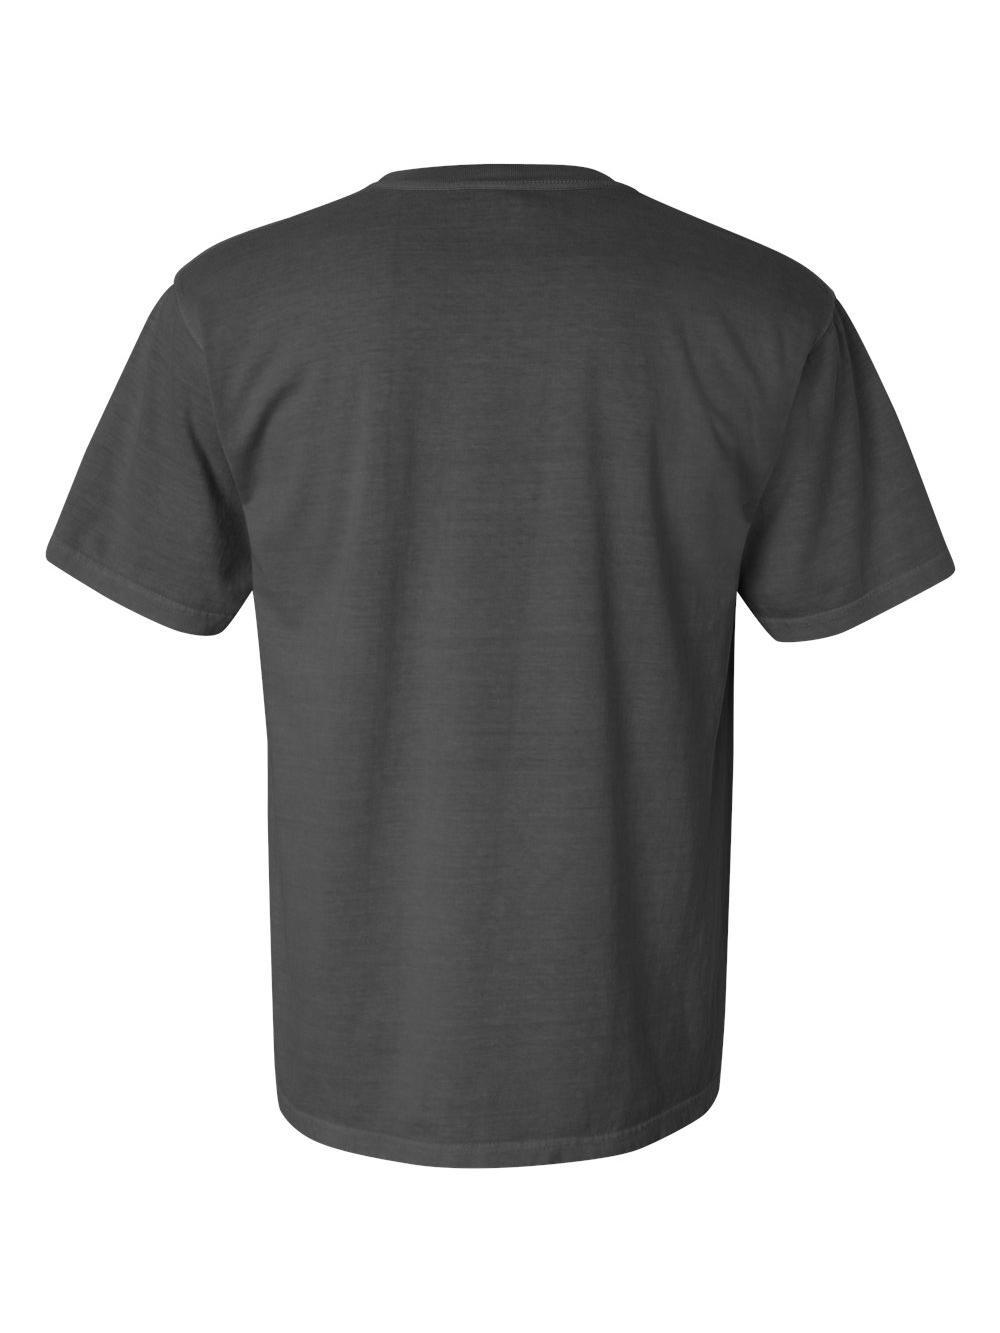 Comfort-Colors-Garment-Dyed-Heavyweight-Ringspun-Short-Sleeve-Shirt-1717 thumbnail 103